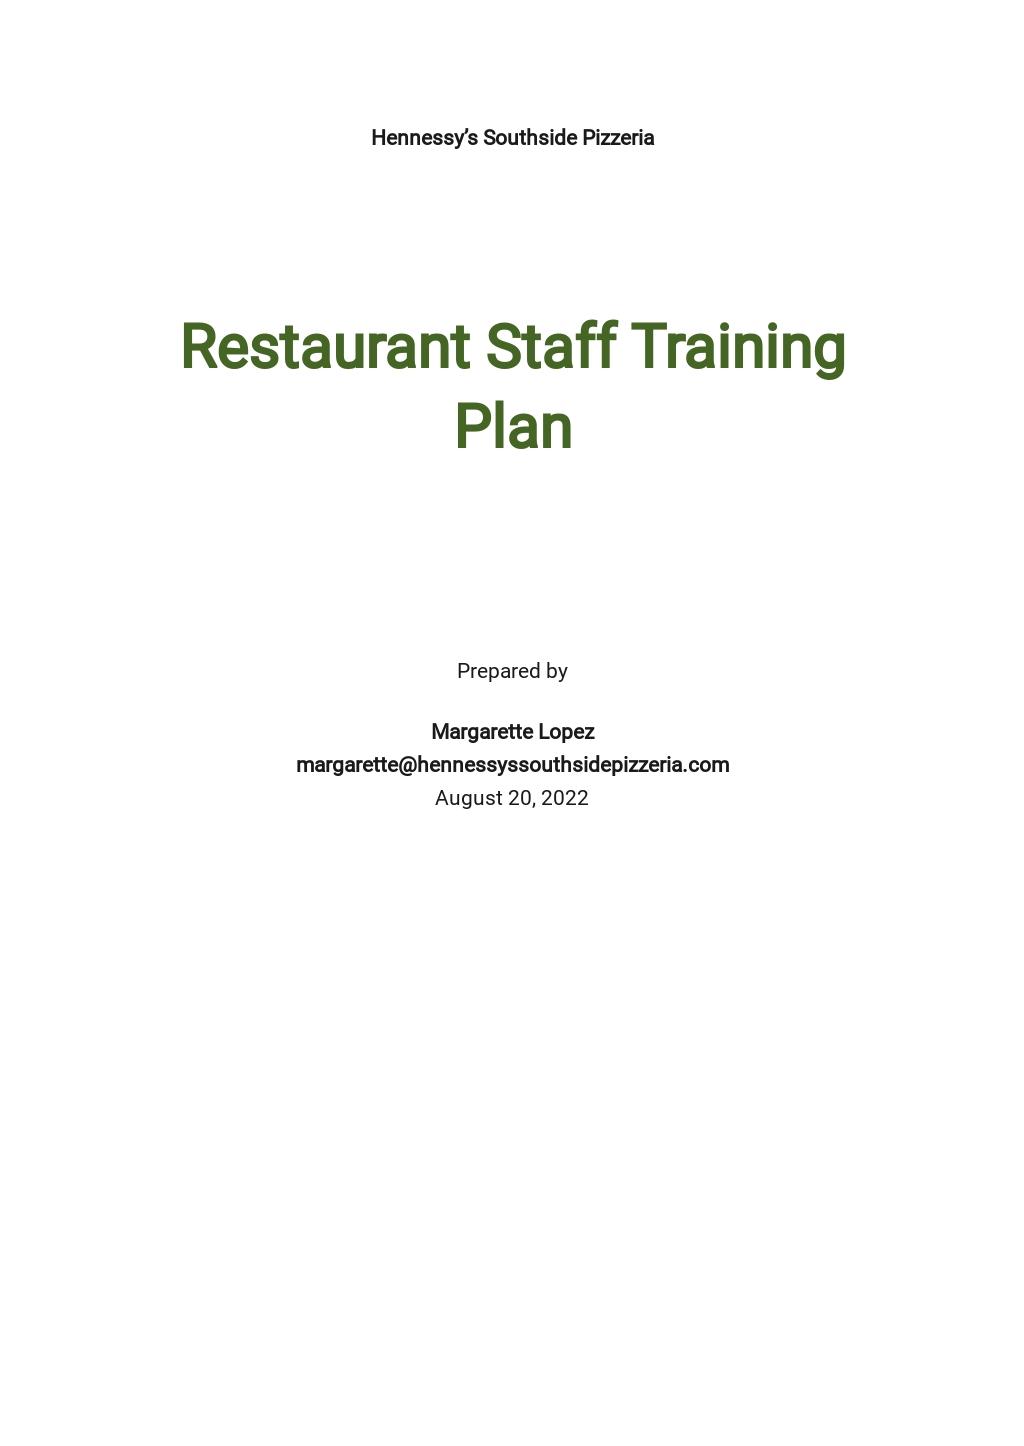 Restaurant Staff Training Plan Template.jpe